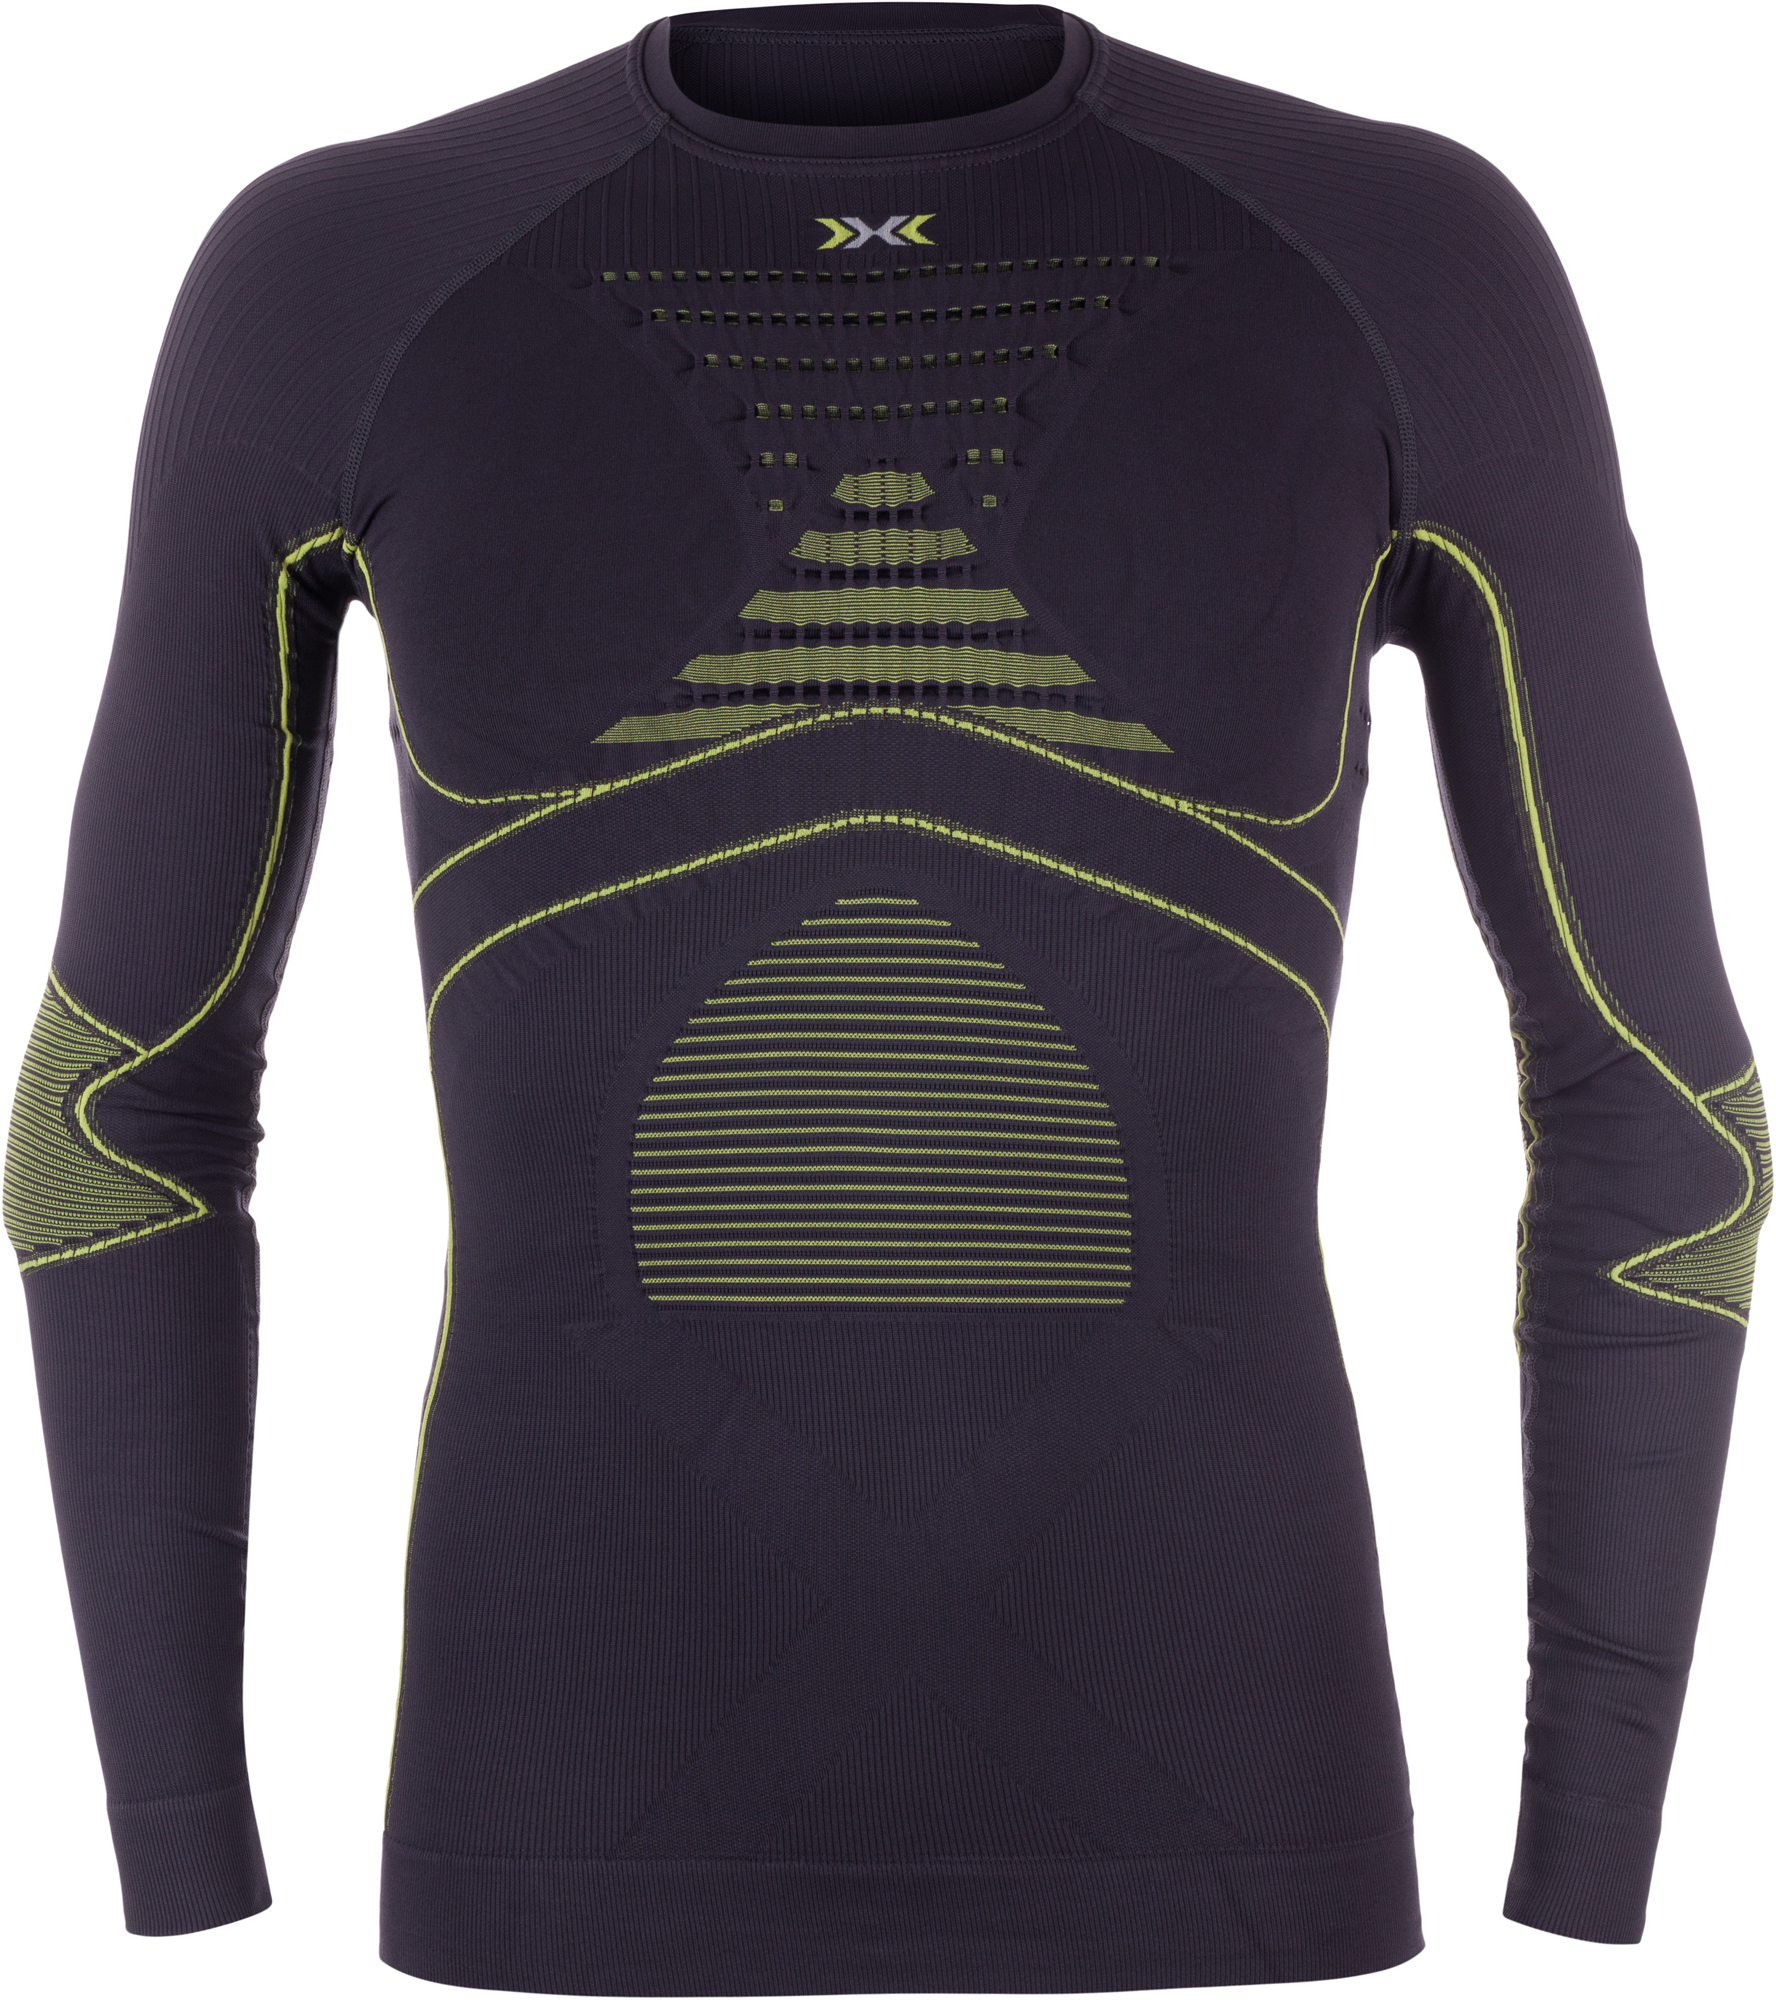 X-Bionic Фуфайка мужская X-Bionic, размер 54 футболка x bionic x bionic effektor running powershirt®